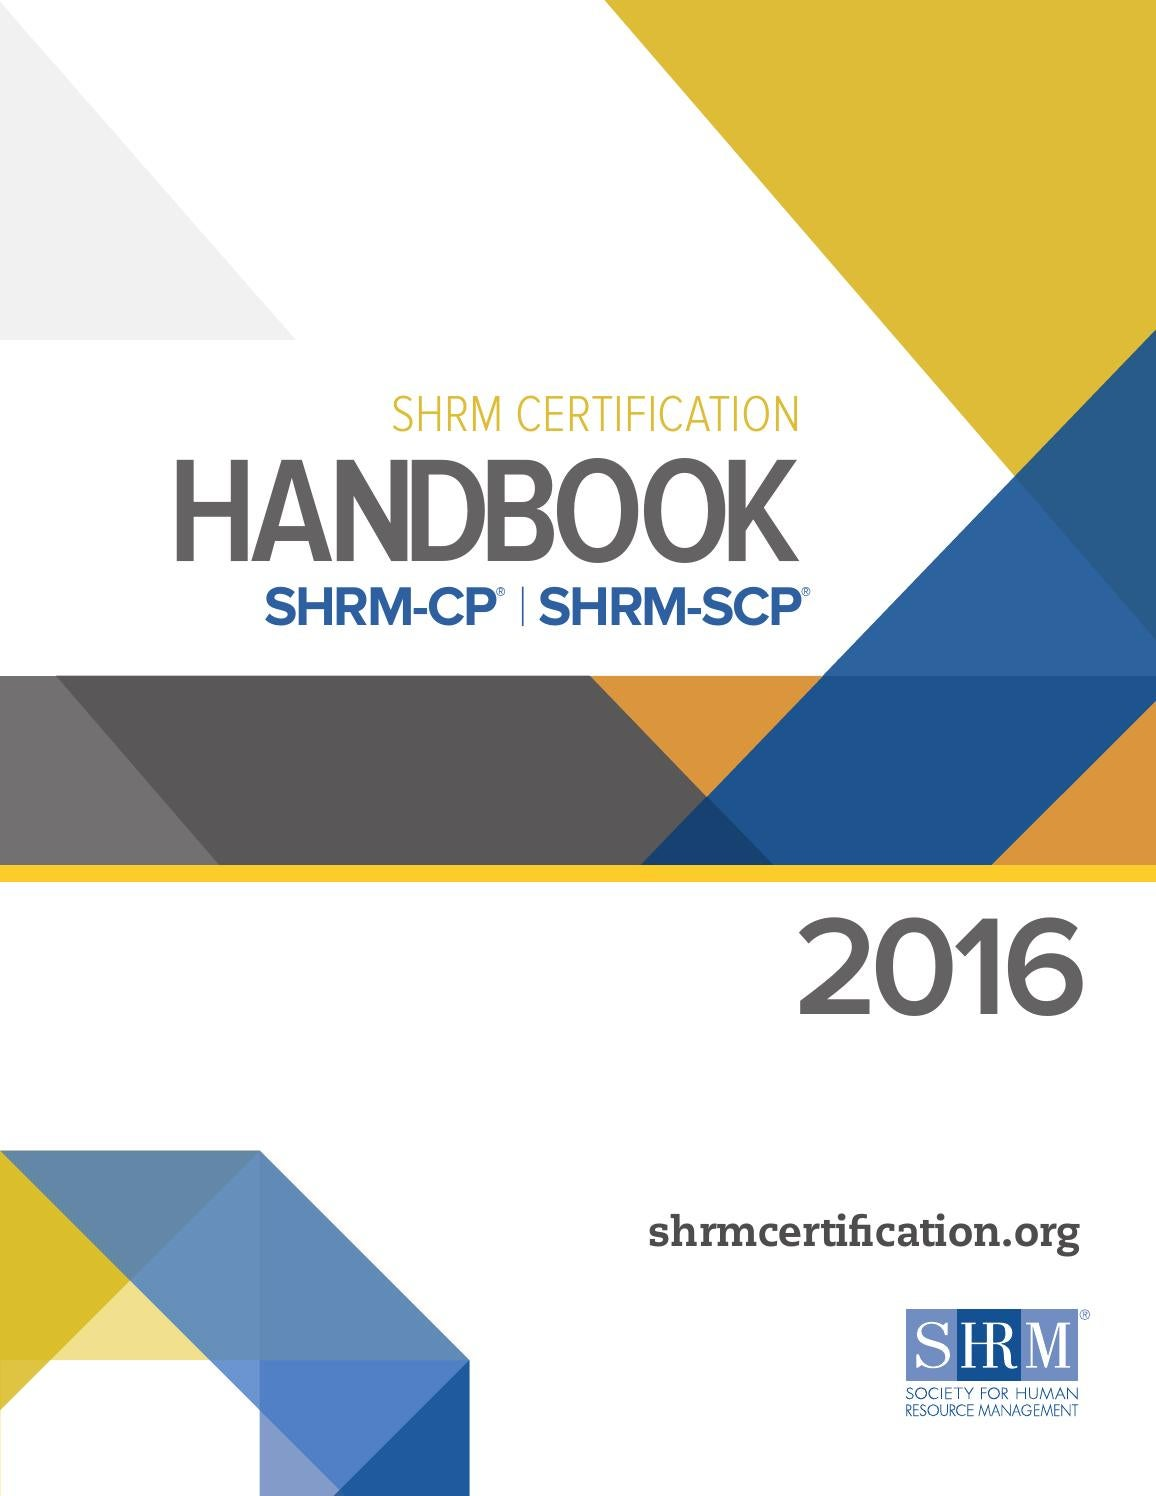 Certification handbookfinal by felix agosto issuu 1betcityfo Choice Image